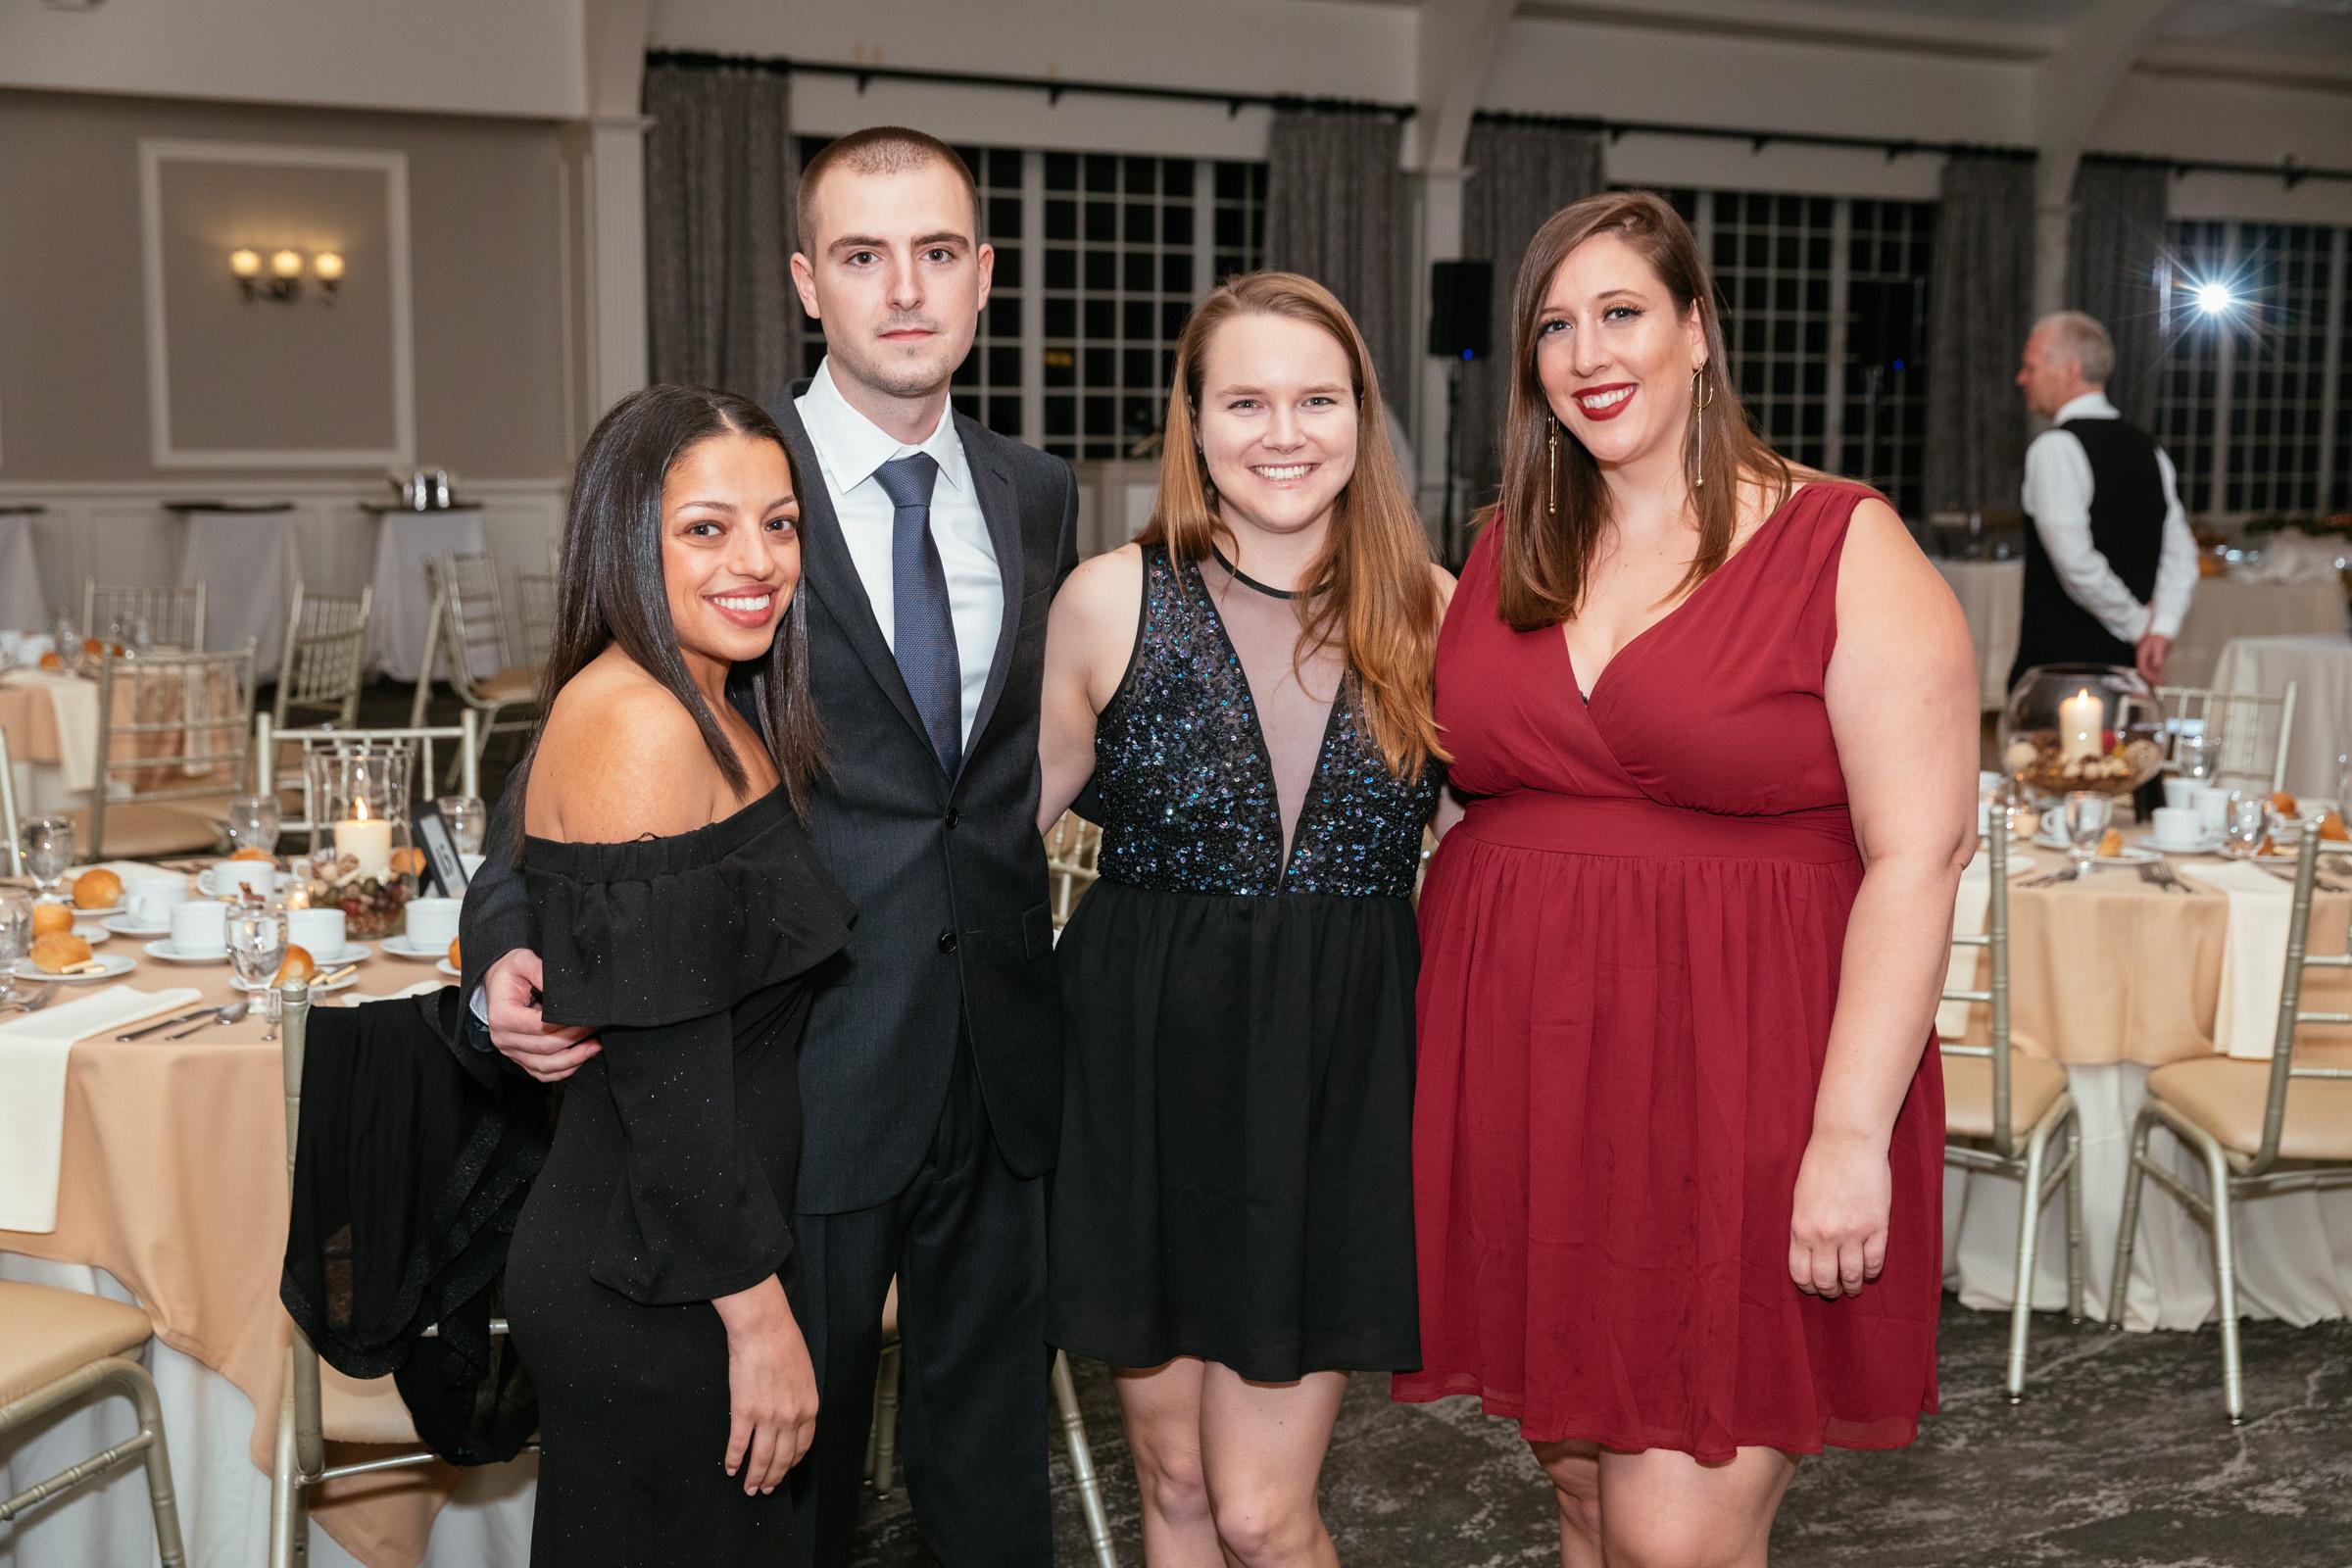 Elizabeth Carozza, Mark Carozza, Monica Garvey, Jennifer Farina